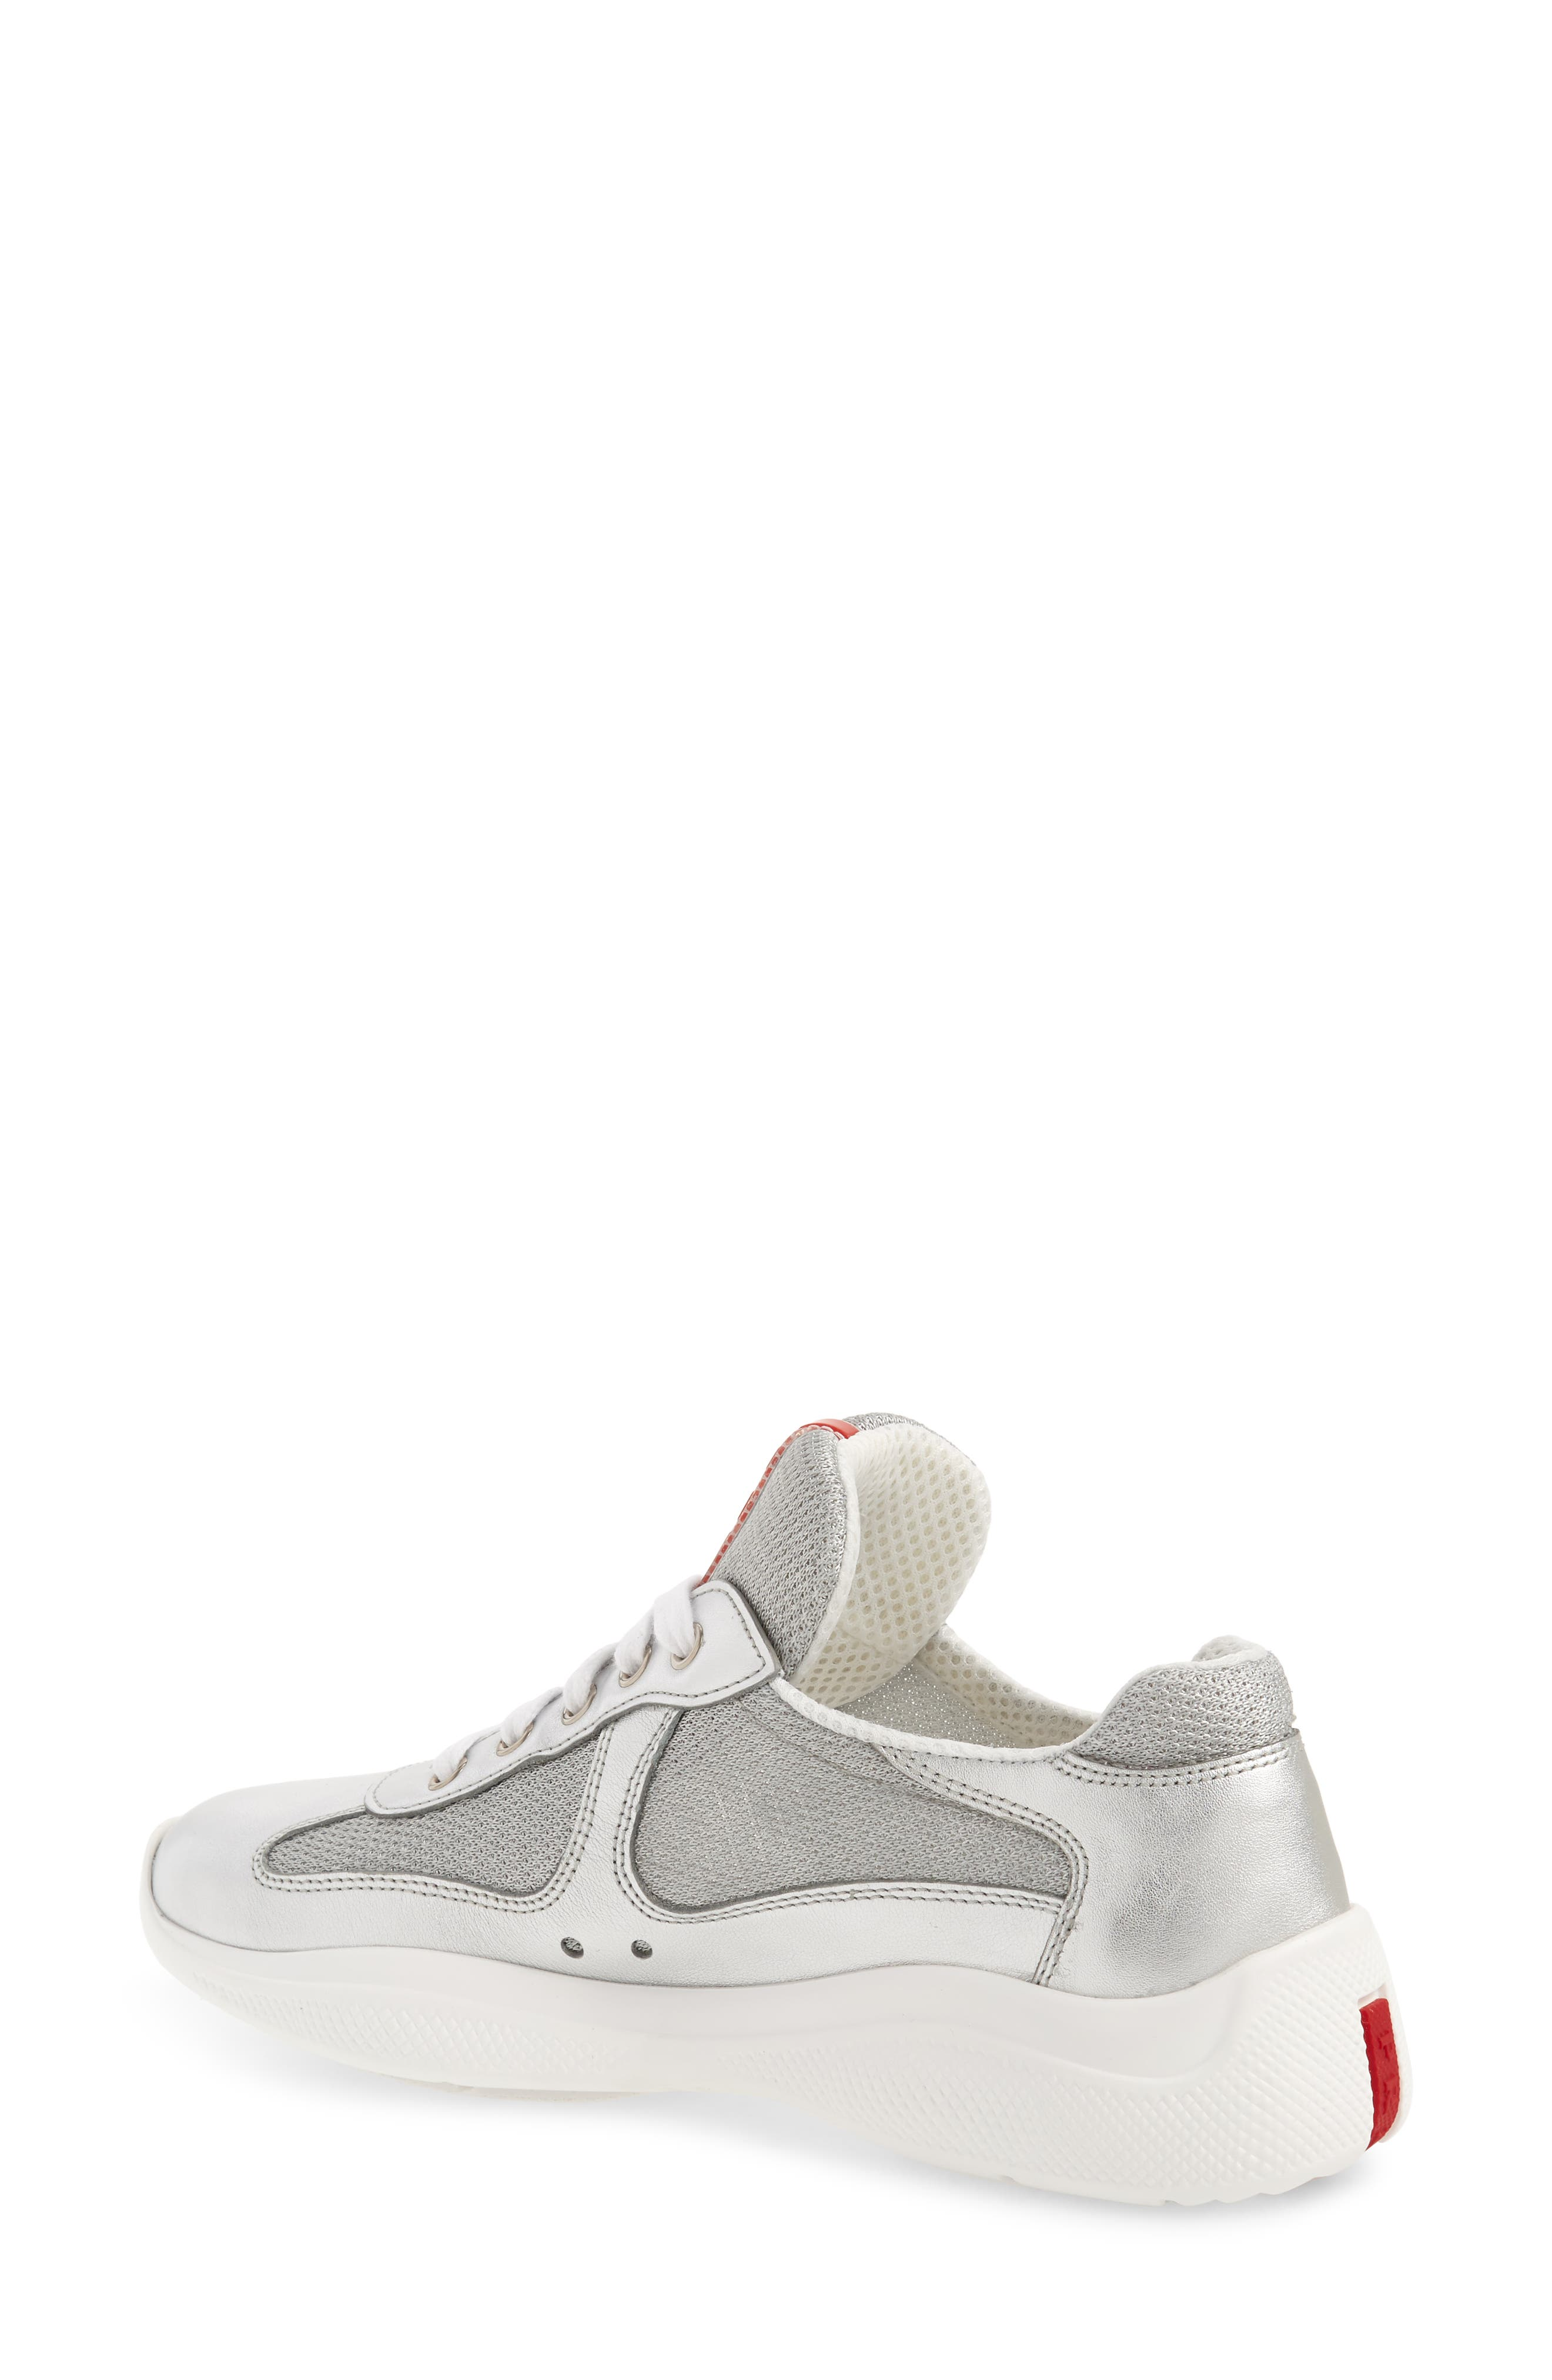 Low-Top Sneaker,                             Alternate thumbnail 2, color,                             METALLIC SILVER